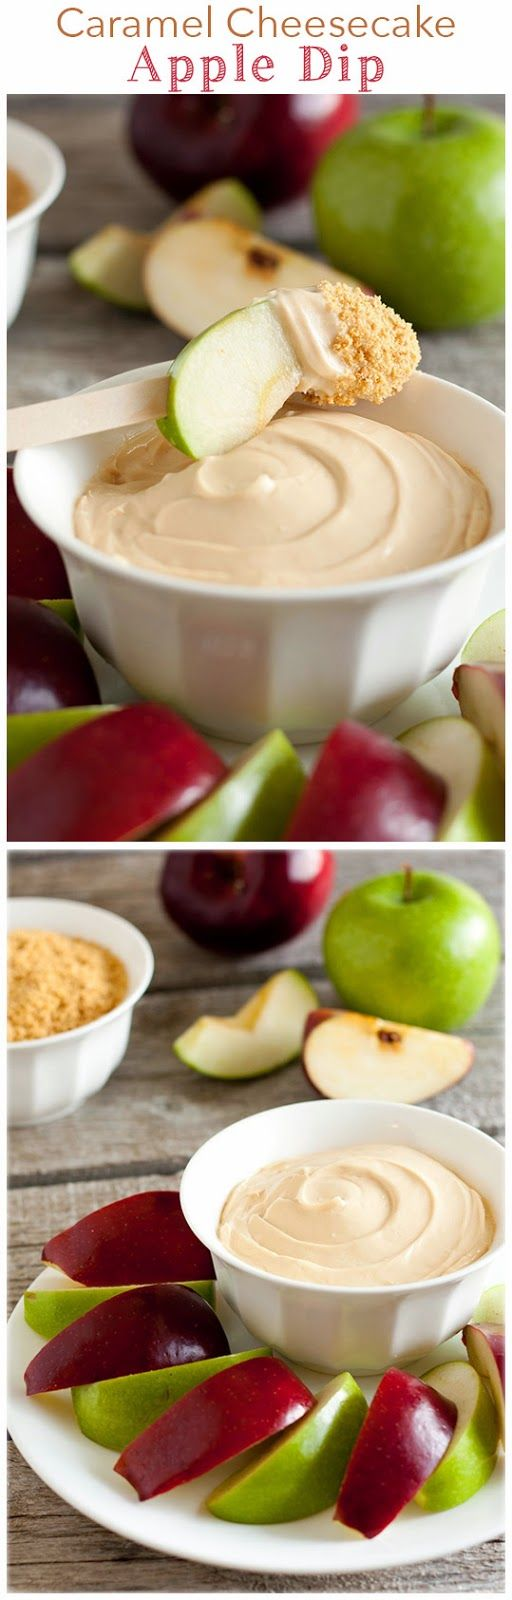 Caramel Cheesecake Apple Dip